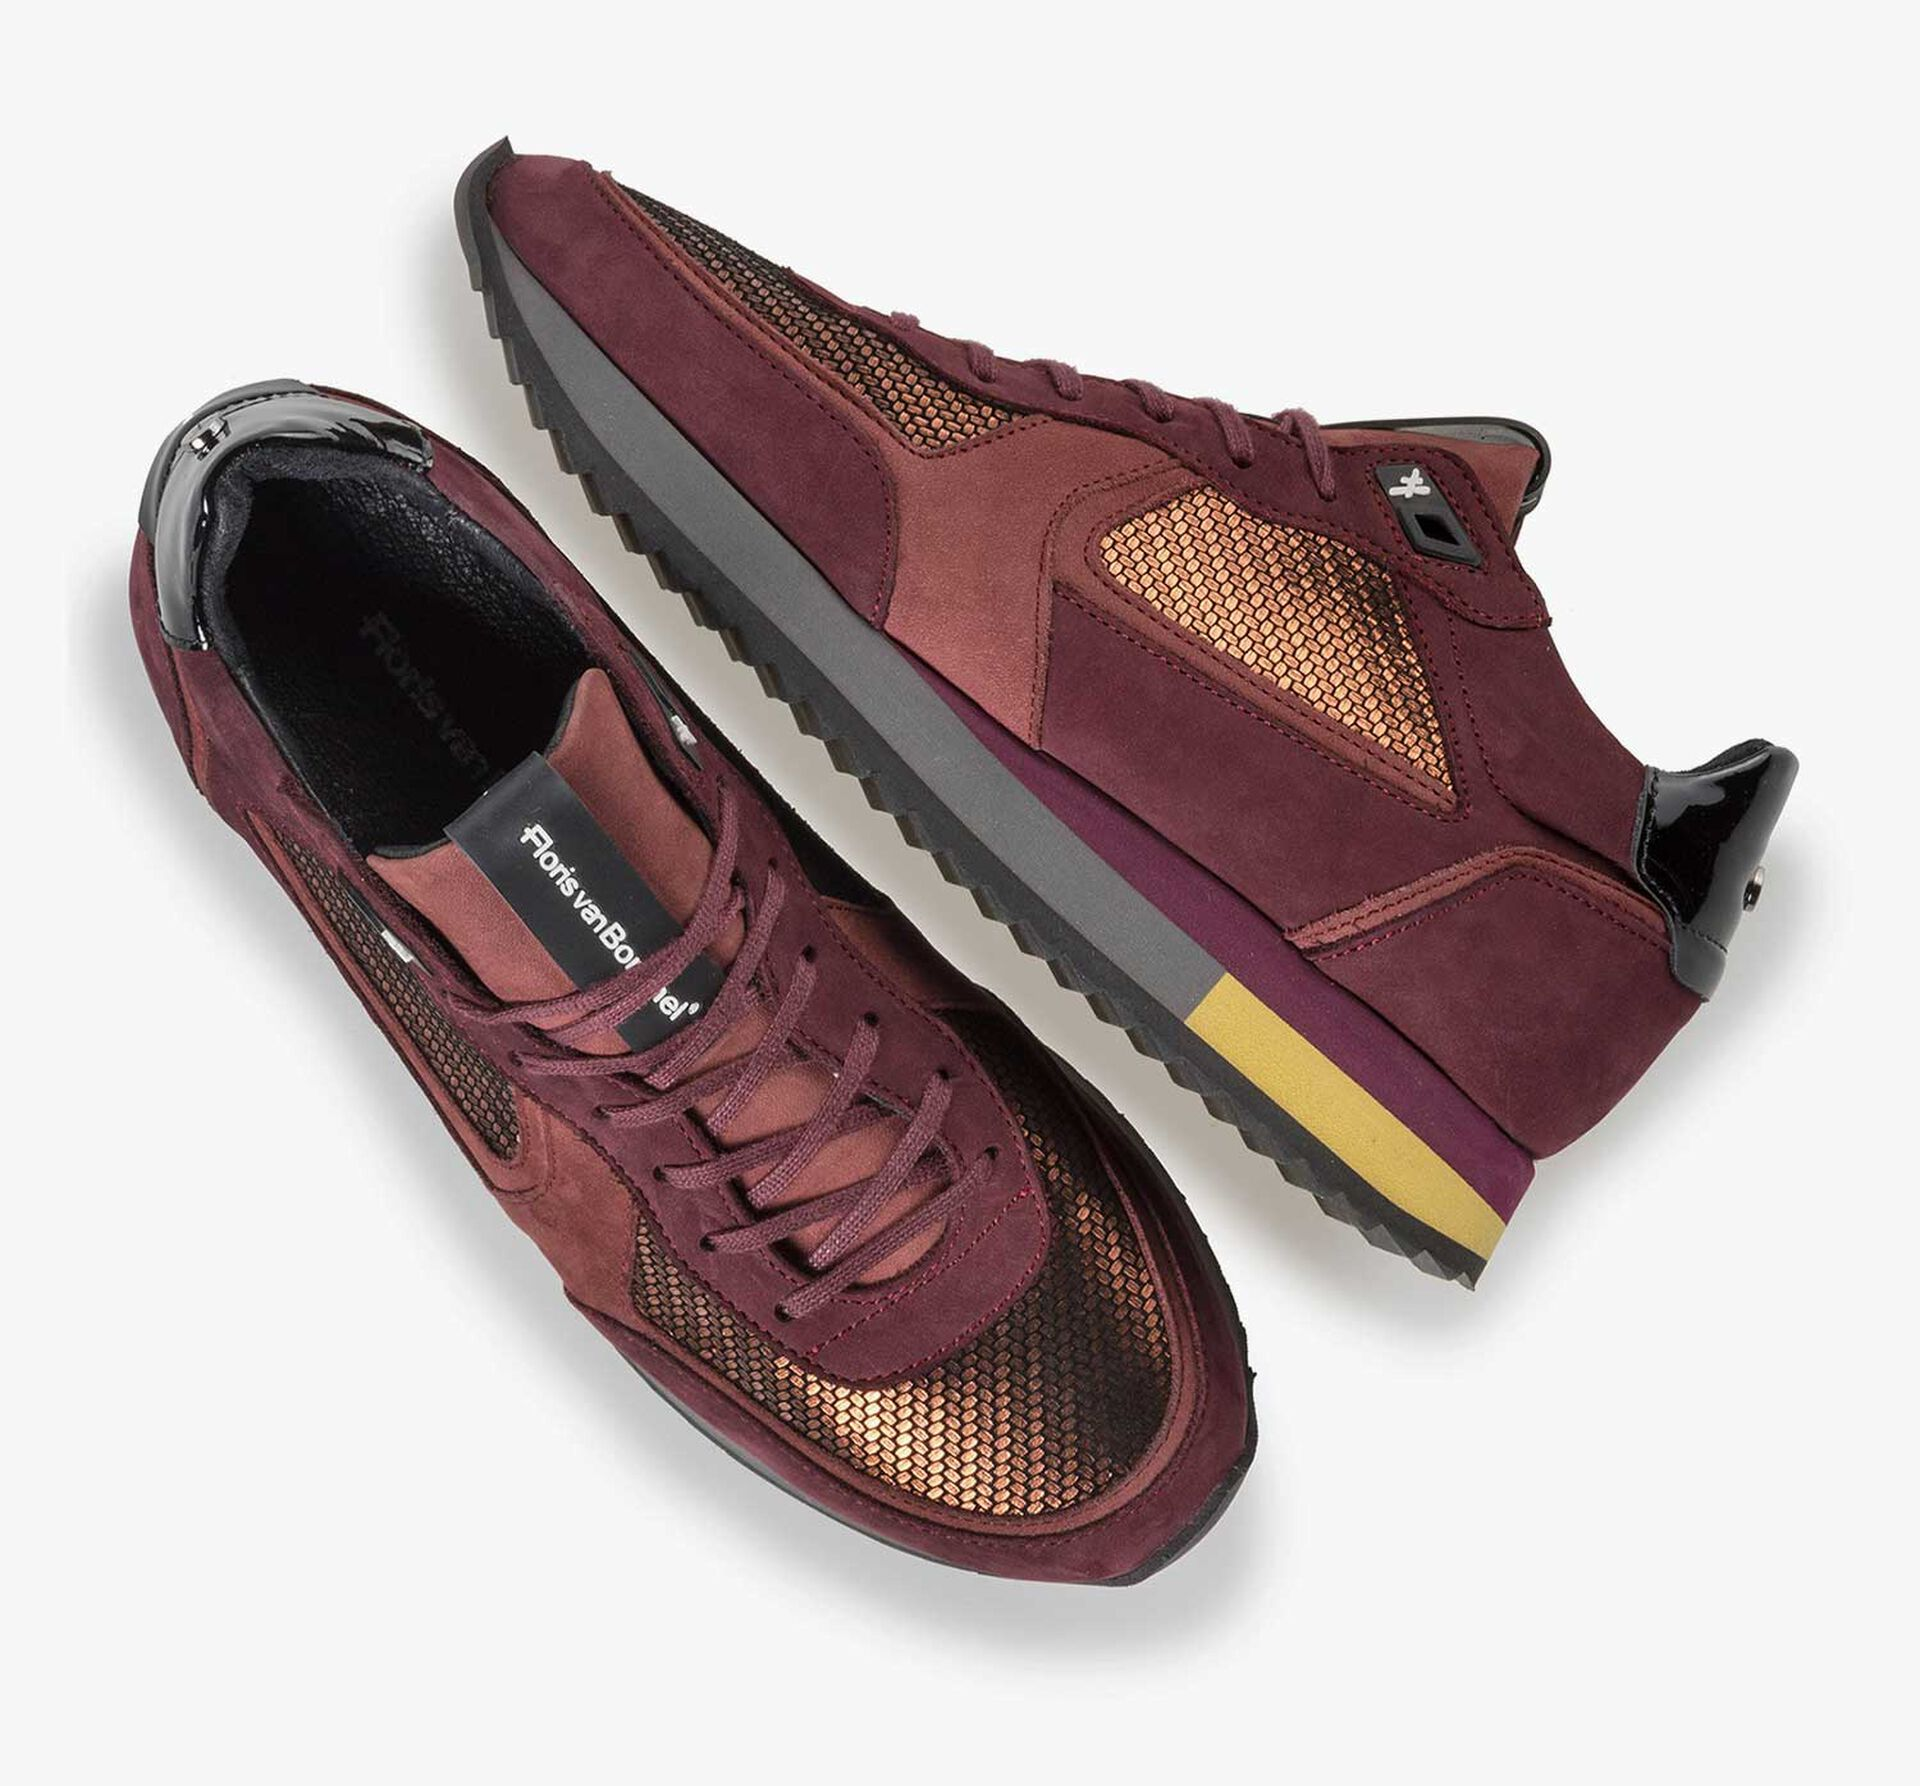 Kupferfarbener Wildleder-Sneaker mit Metallic-Print